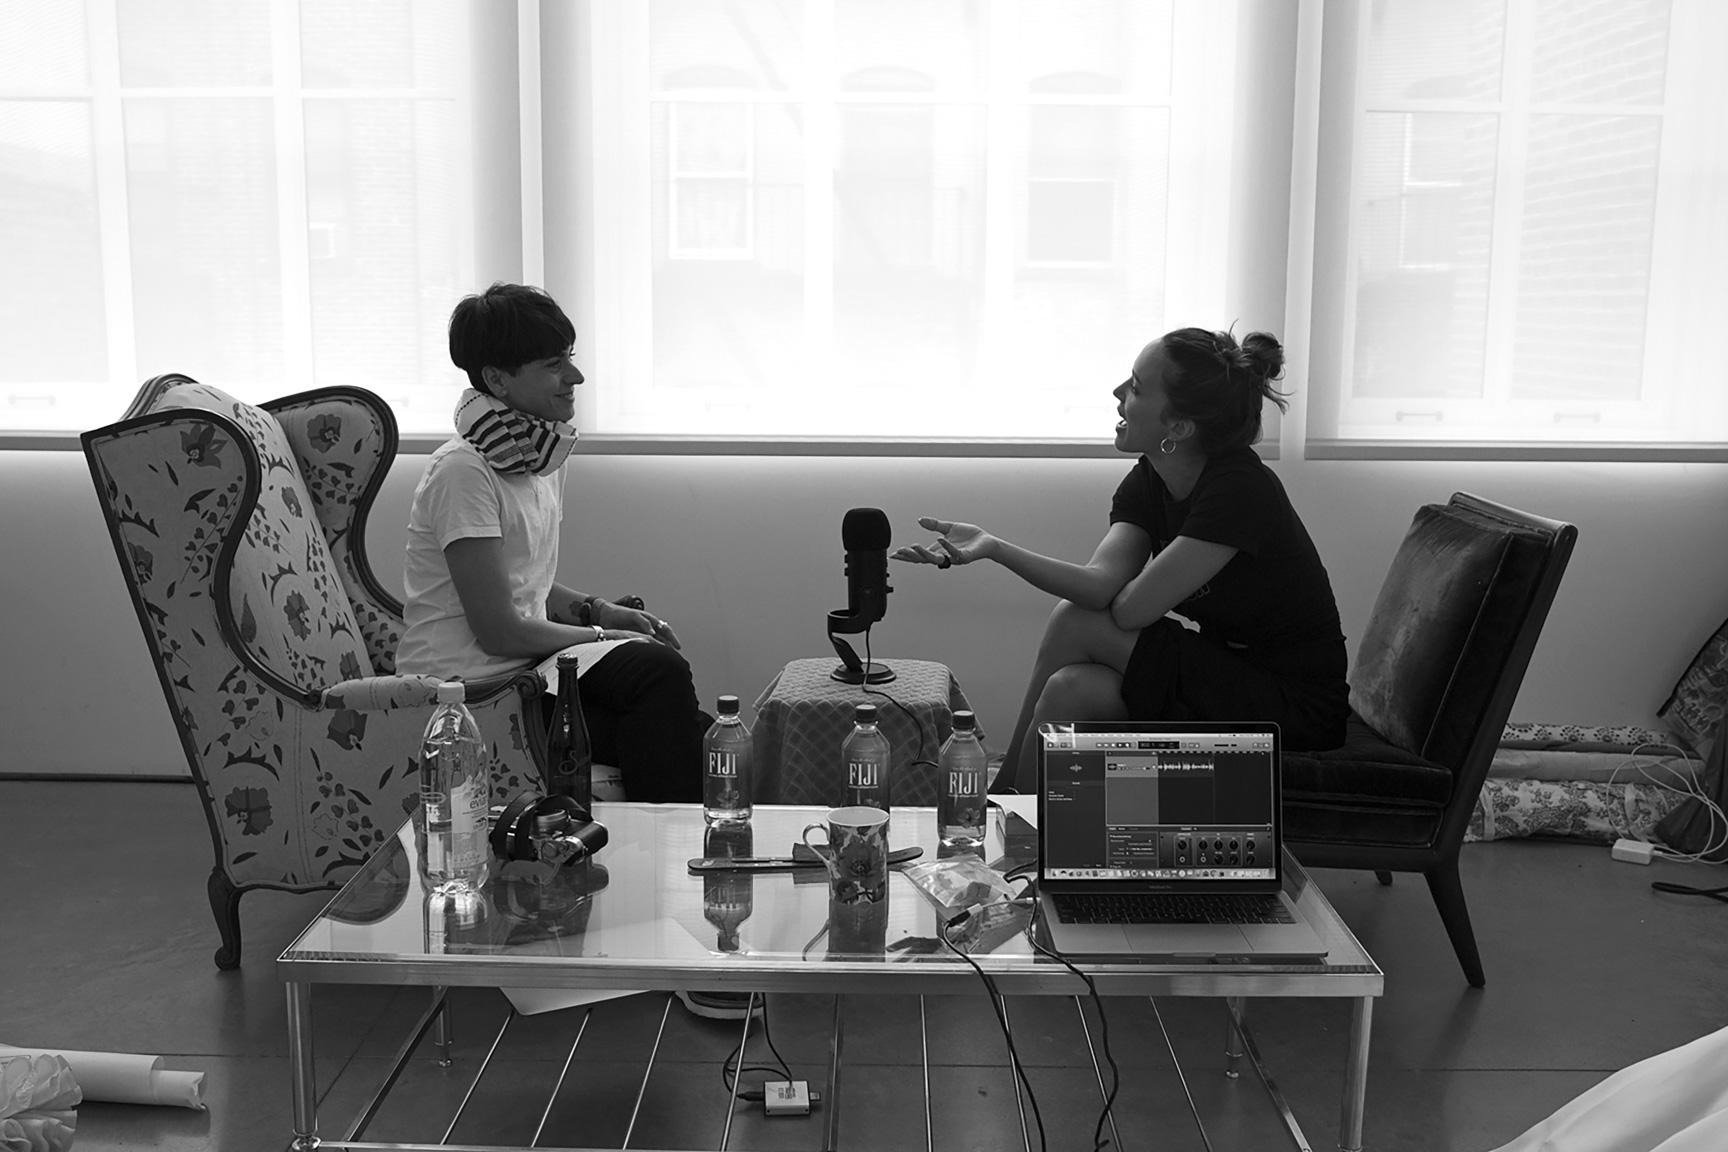 Samantha Paige interviews Zoe Buckman for  Last Cut Conversations , the  Last Cut Project  podcast. Photo: Lisa Field for  Last Cut Project